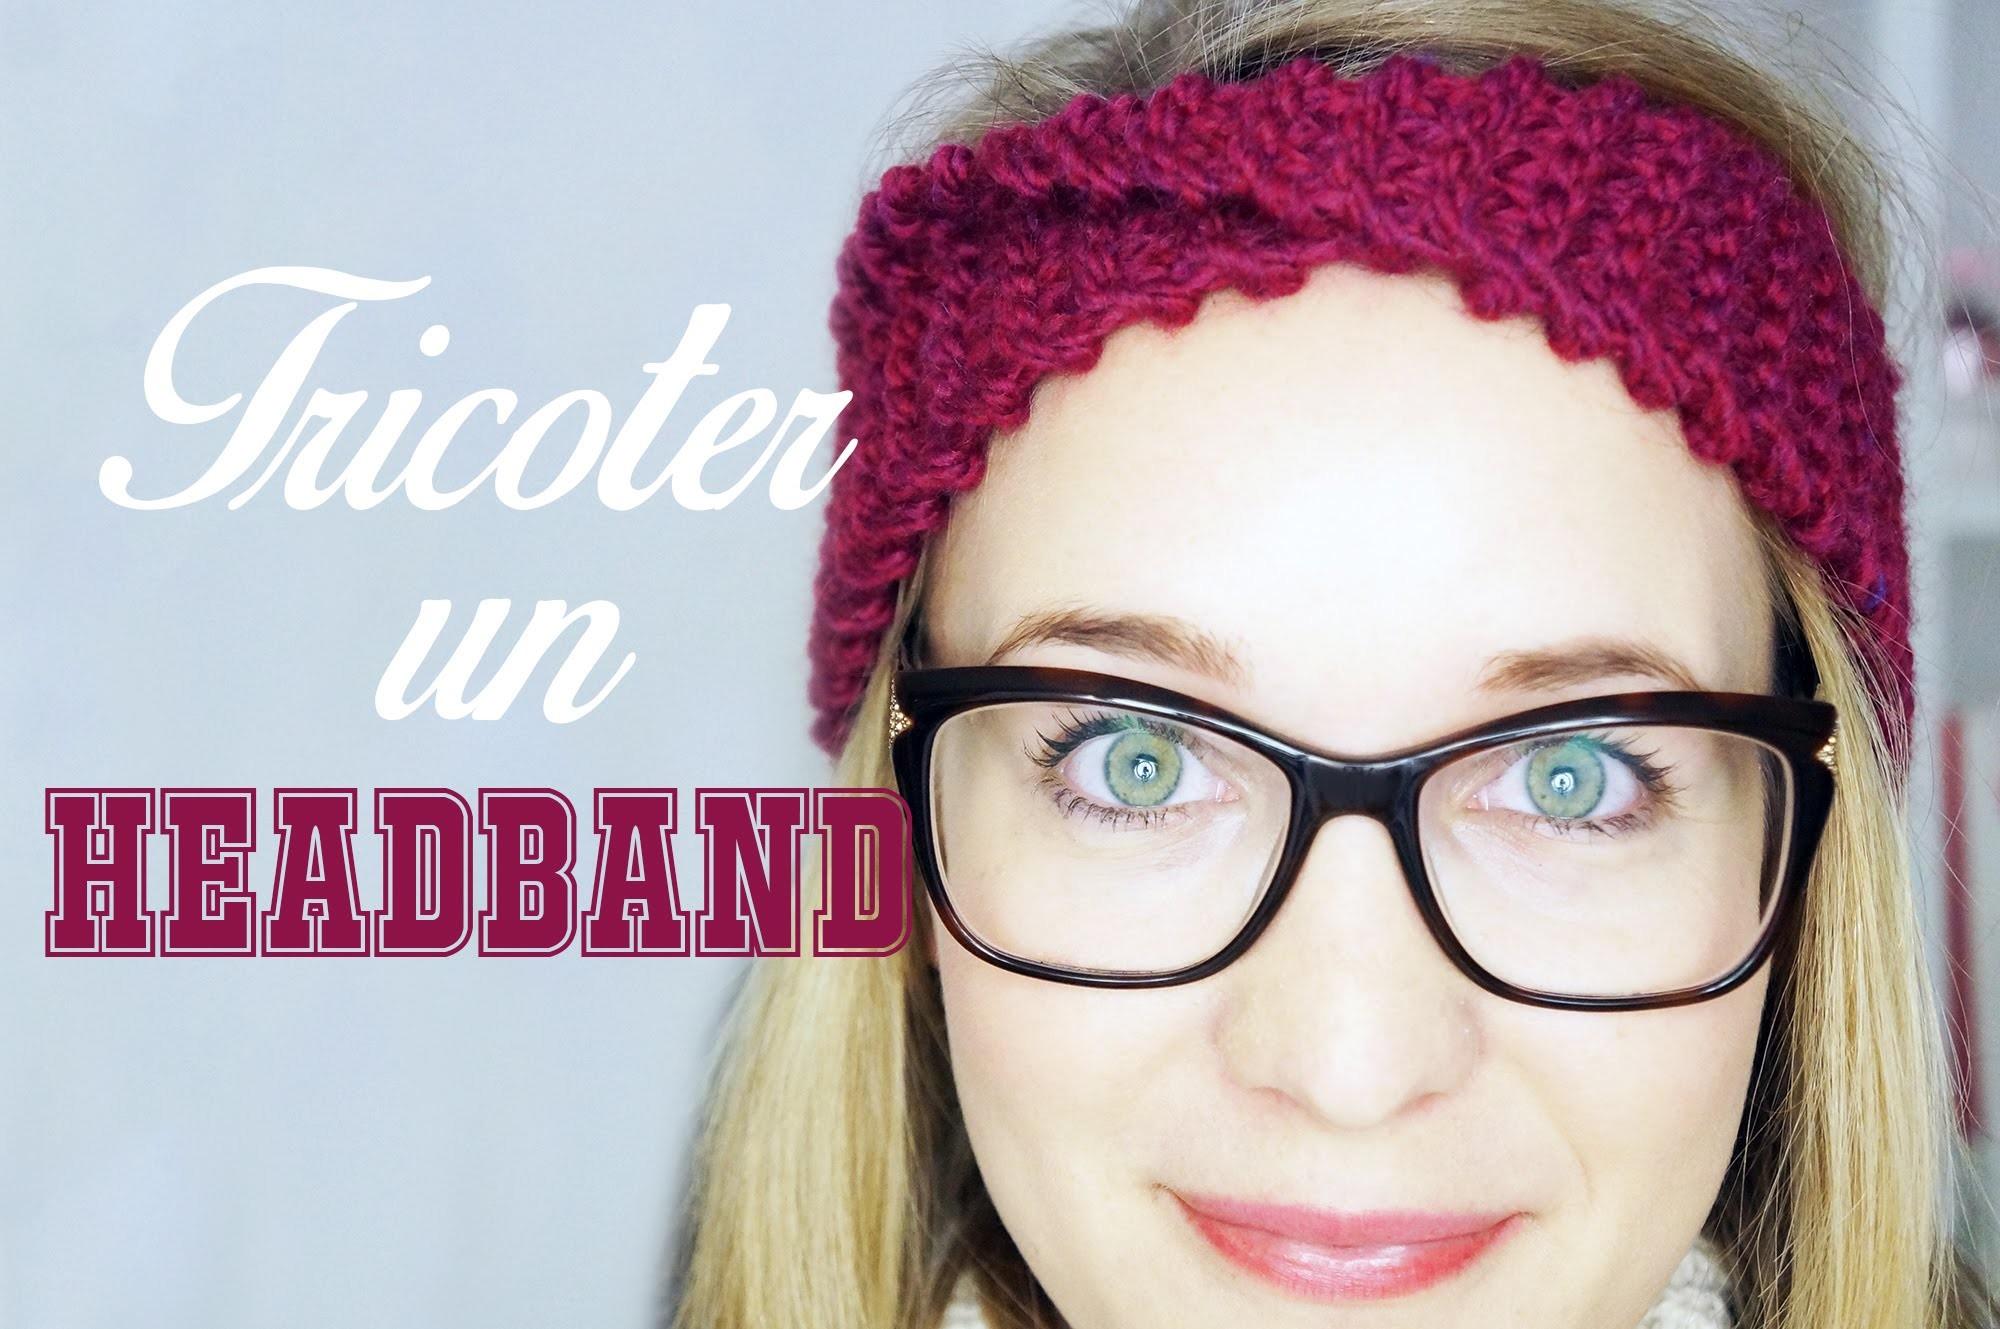 ❄ Tutoriel ❄  : Tricoter un Headband ☃